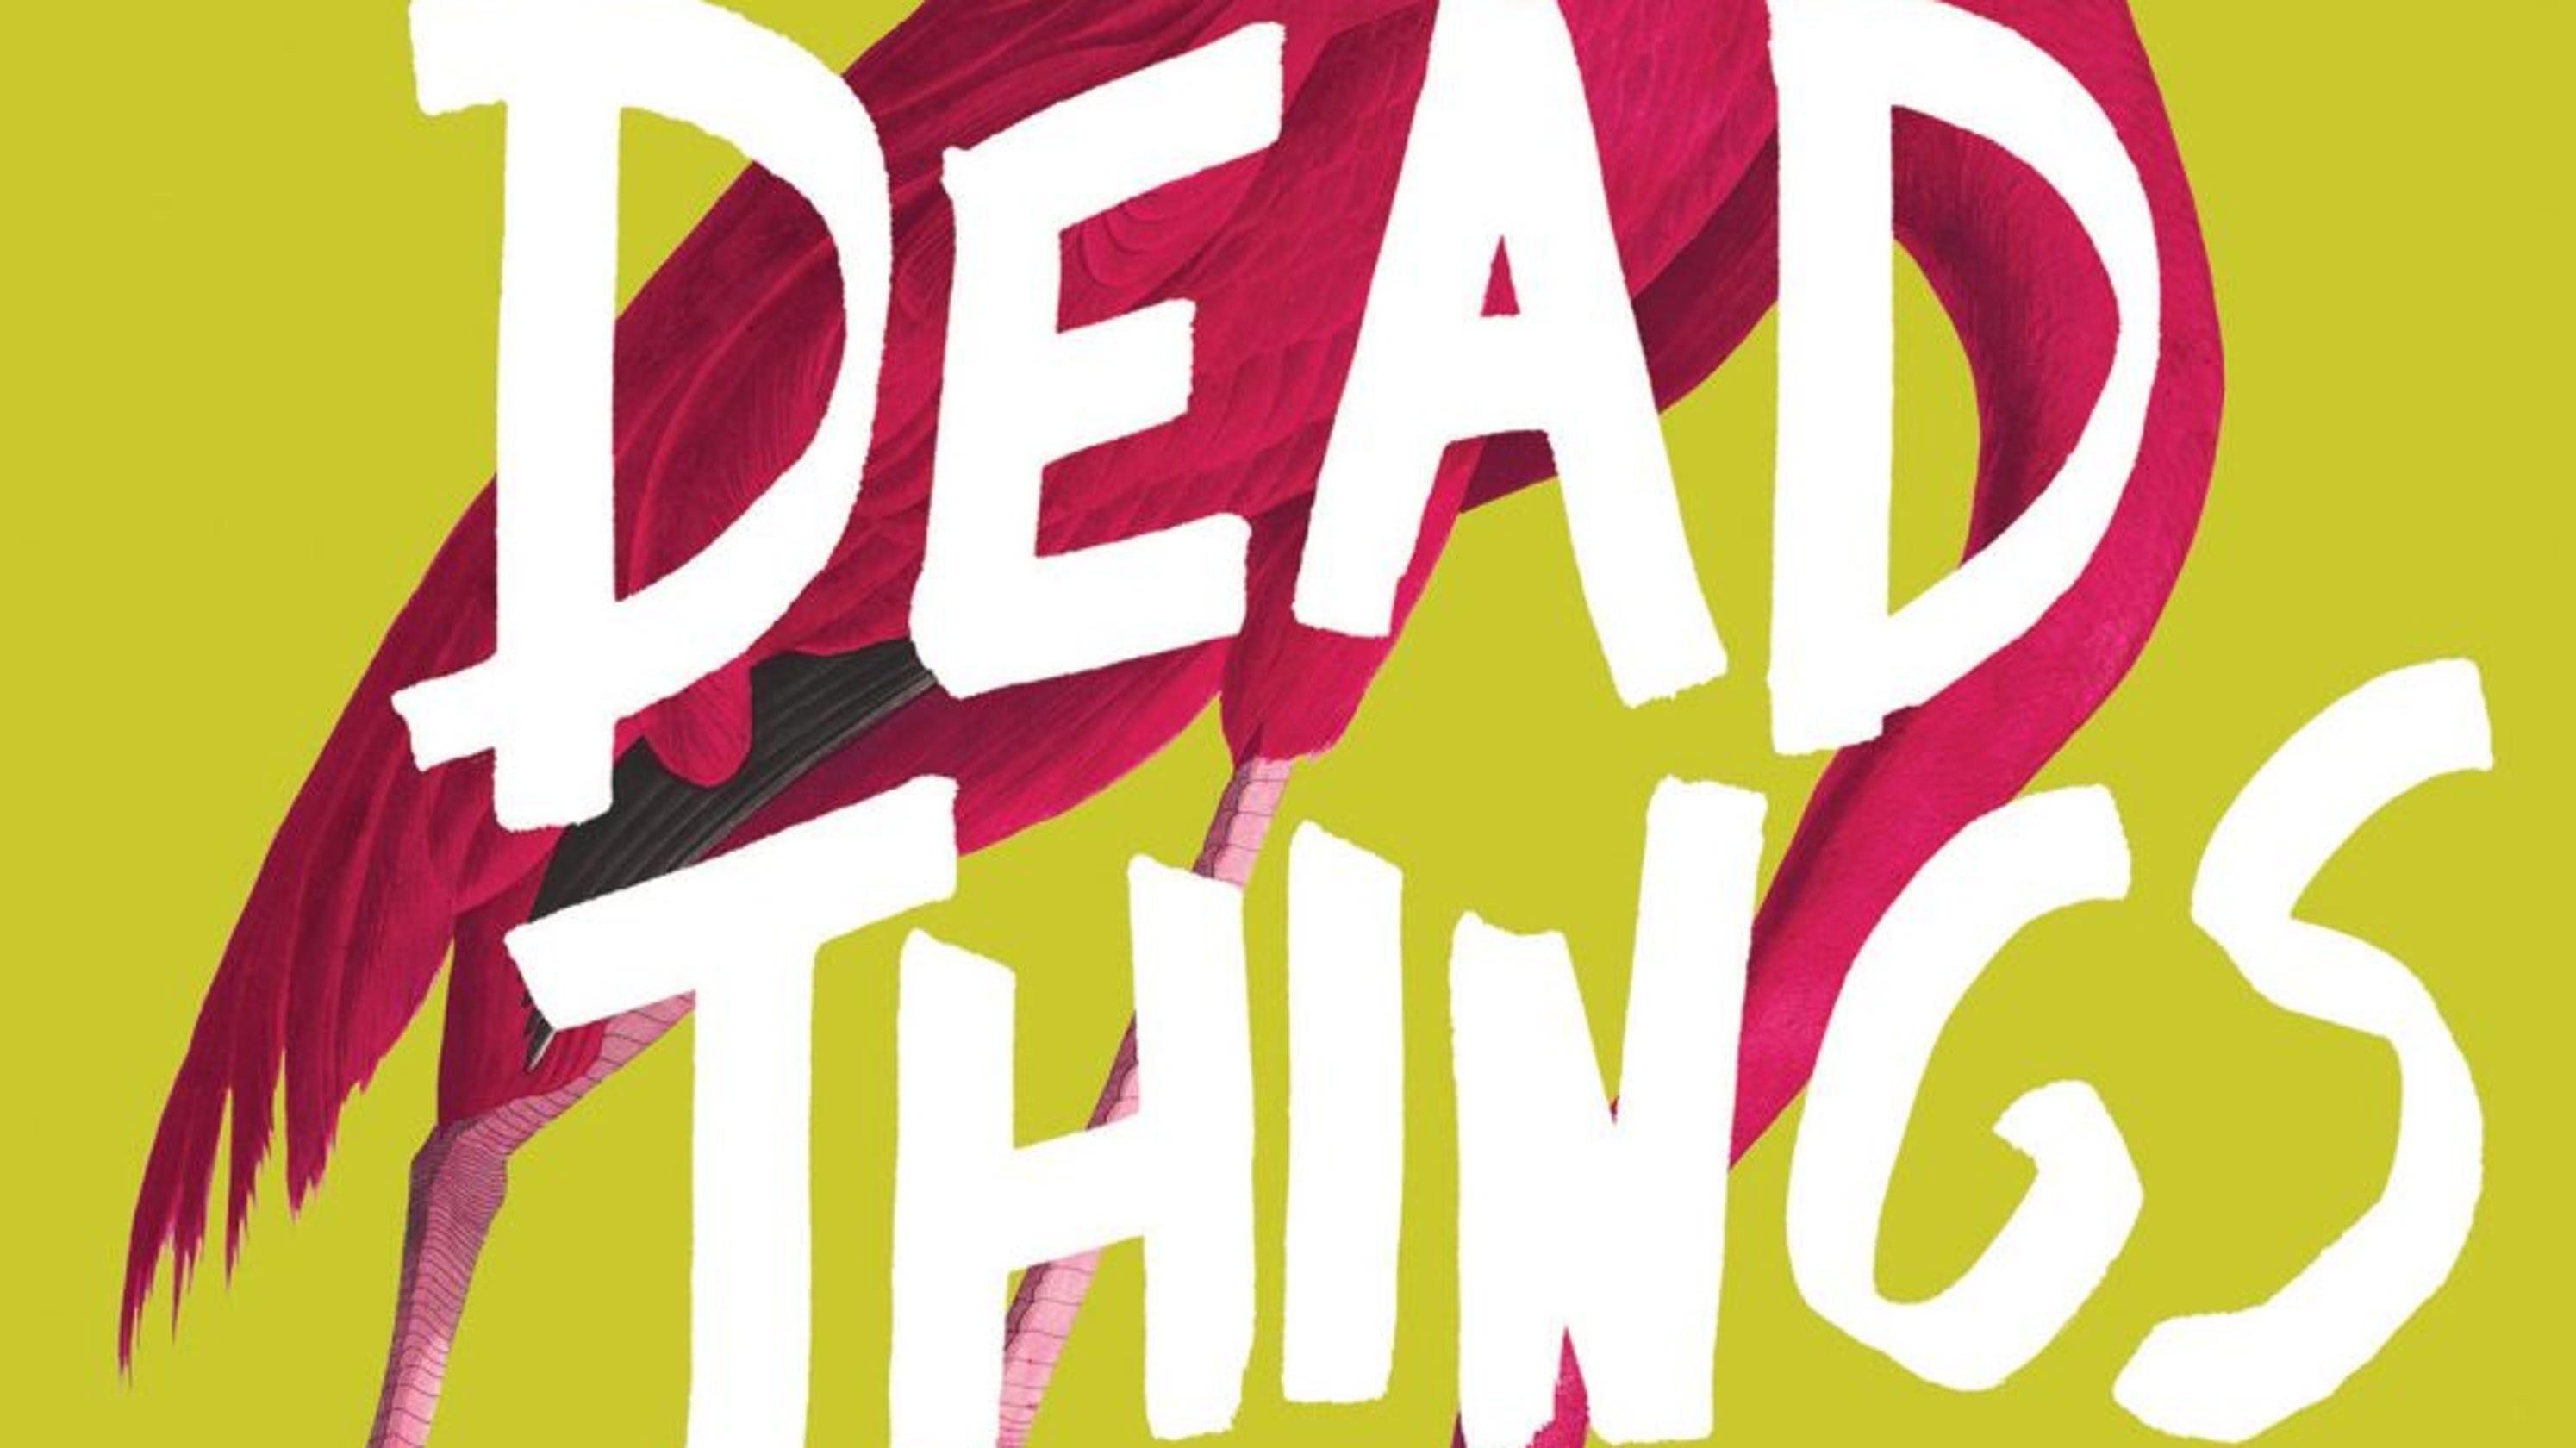 5 hot new books elizabeth gilbert tan france 39 mostly dead things 39. Black Bedroom Furniture Sets. Home Design Ideas